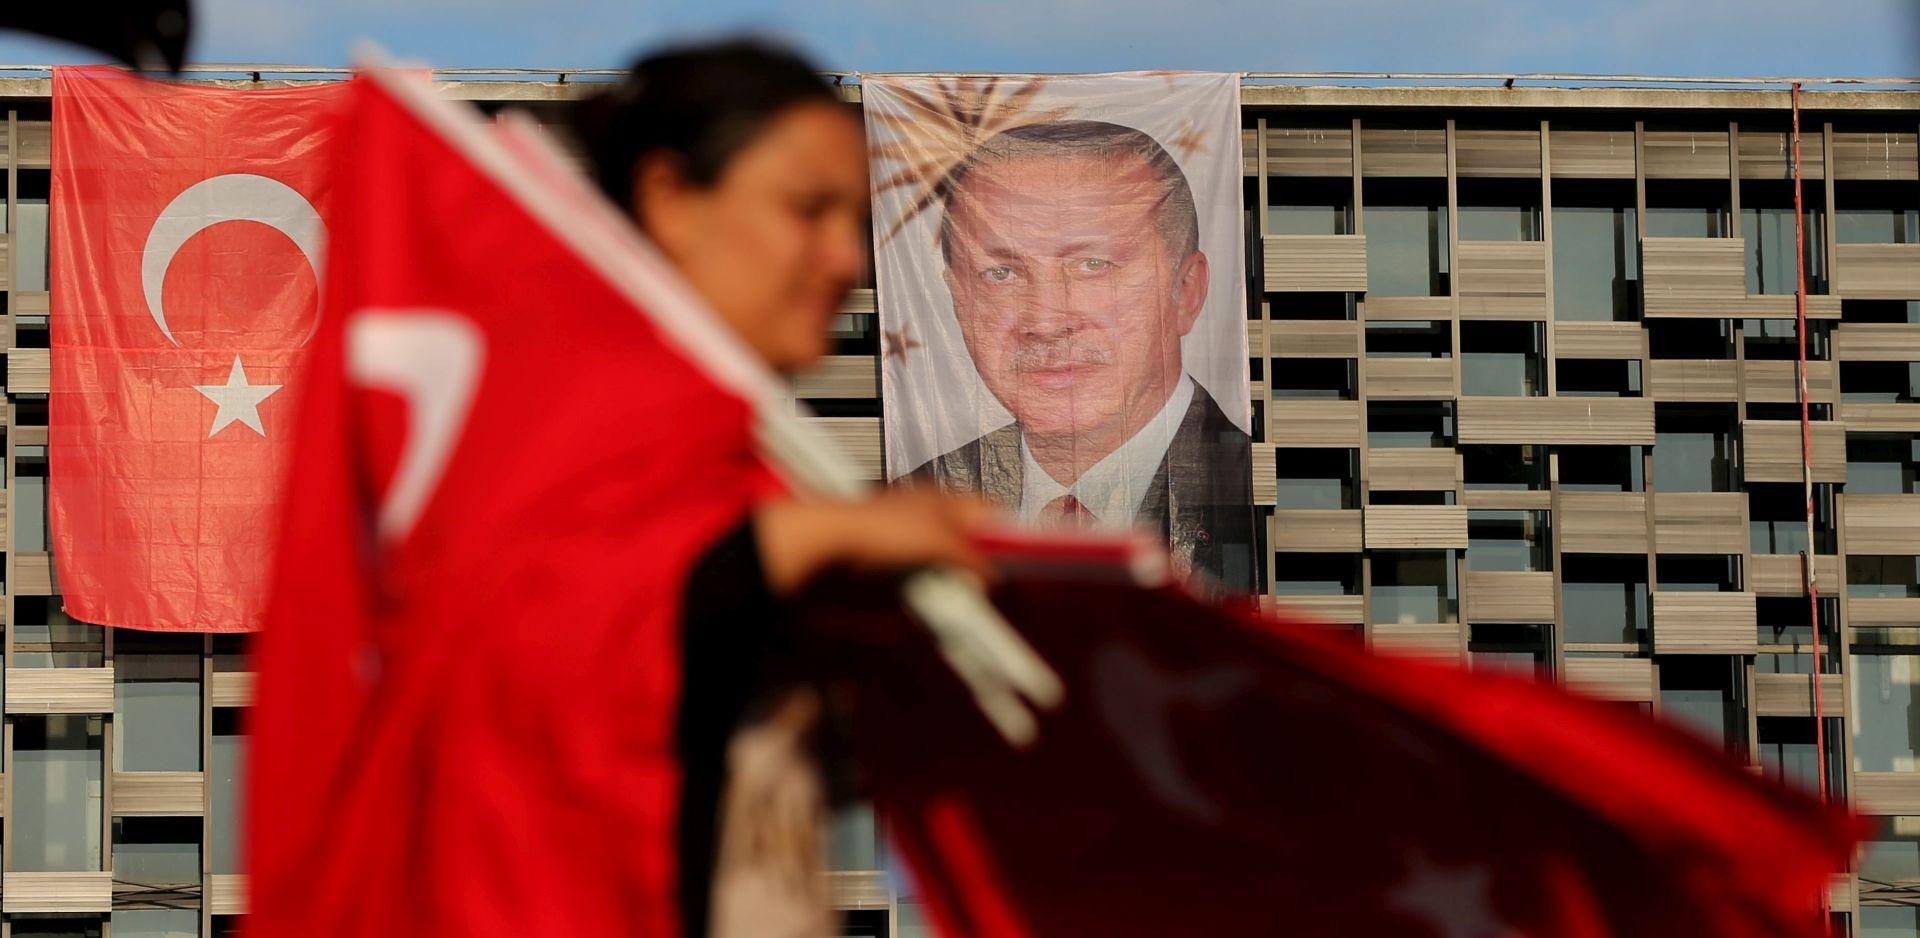 ČISTKA SE NASTAVLJA: Turska suspendirala 900 ankarskih policajaca